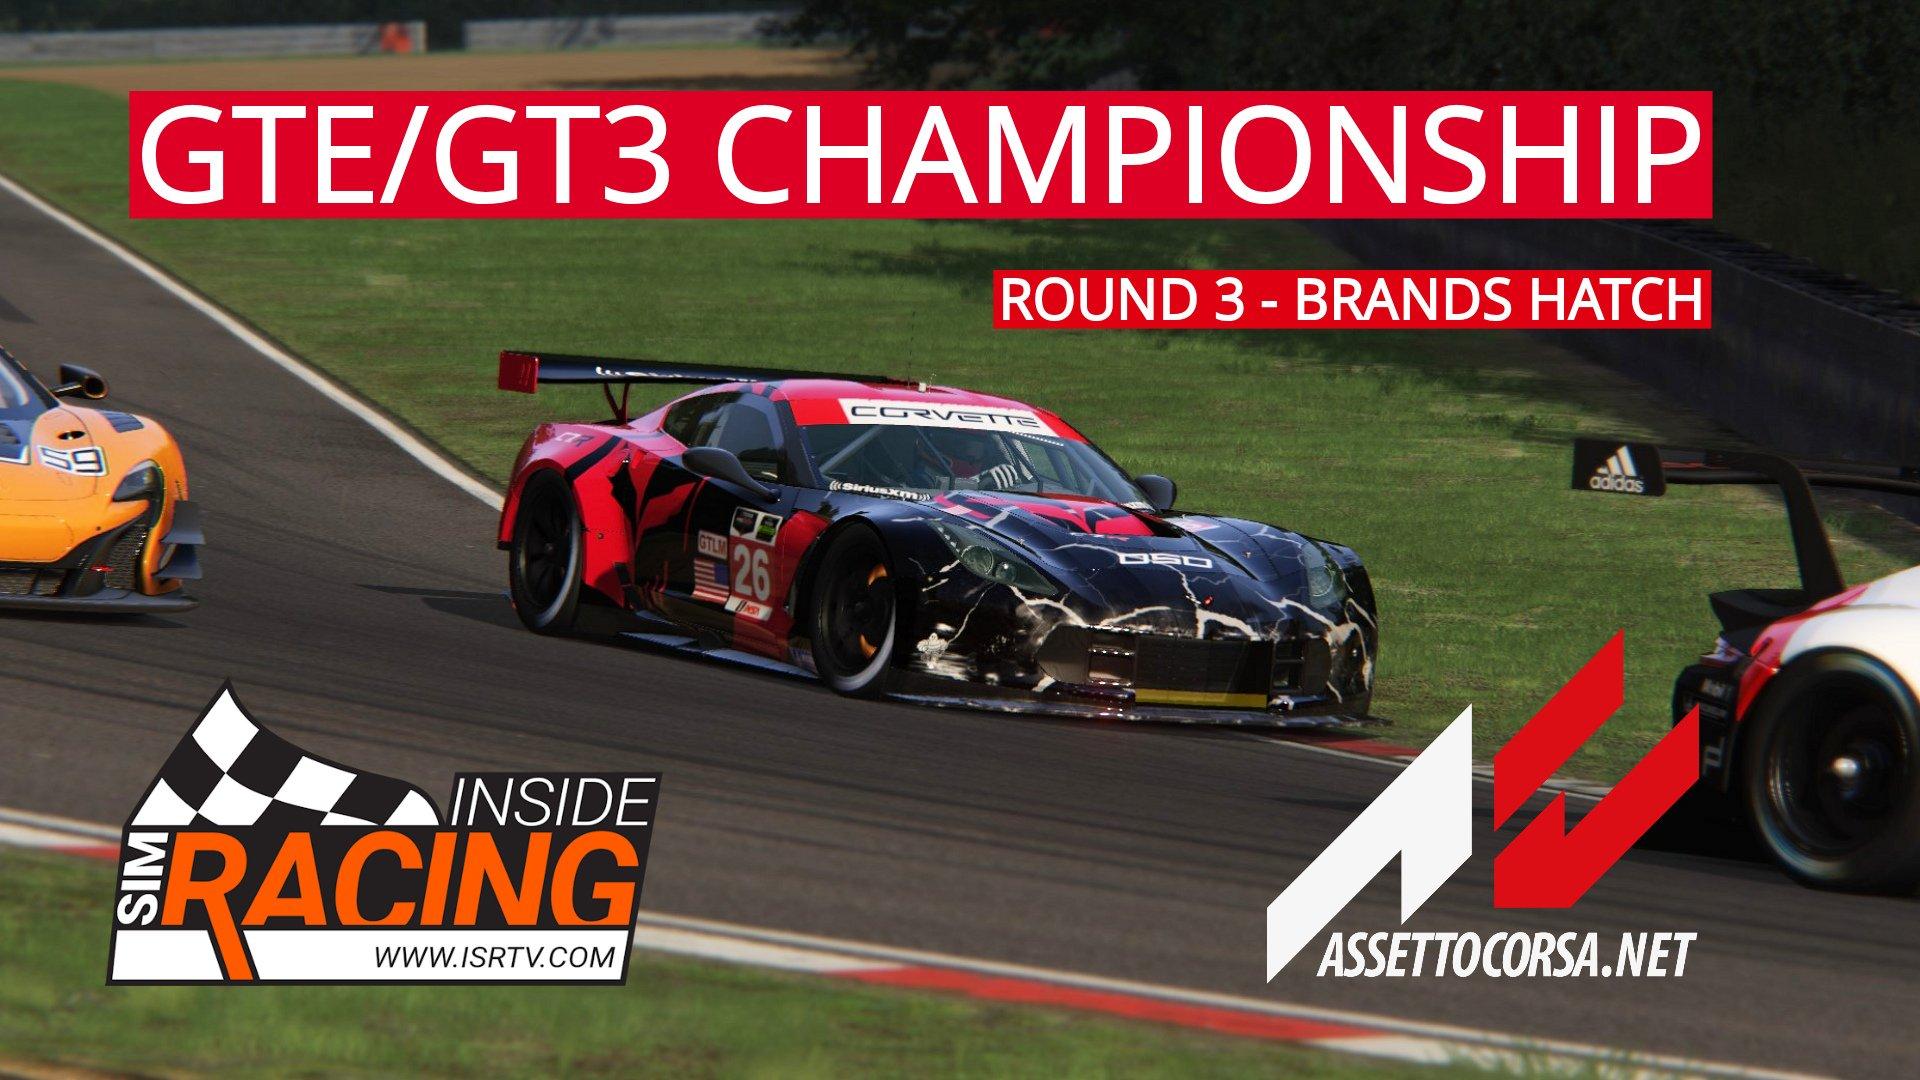 Assetto-Corsa-GTE-GT3-Championship-Round-3-Brands-TN